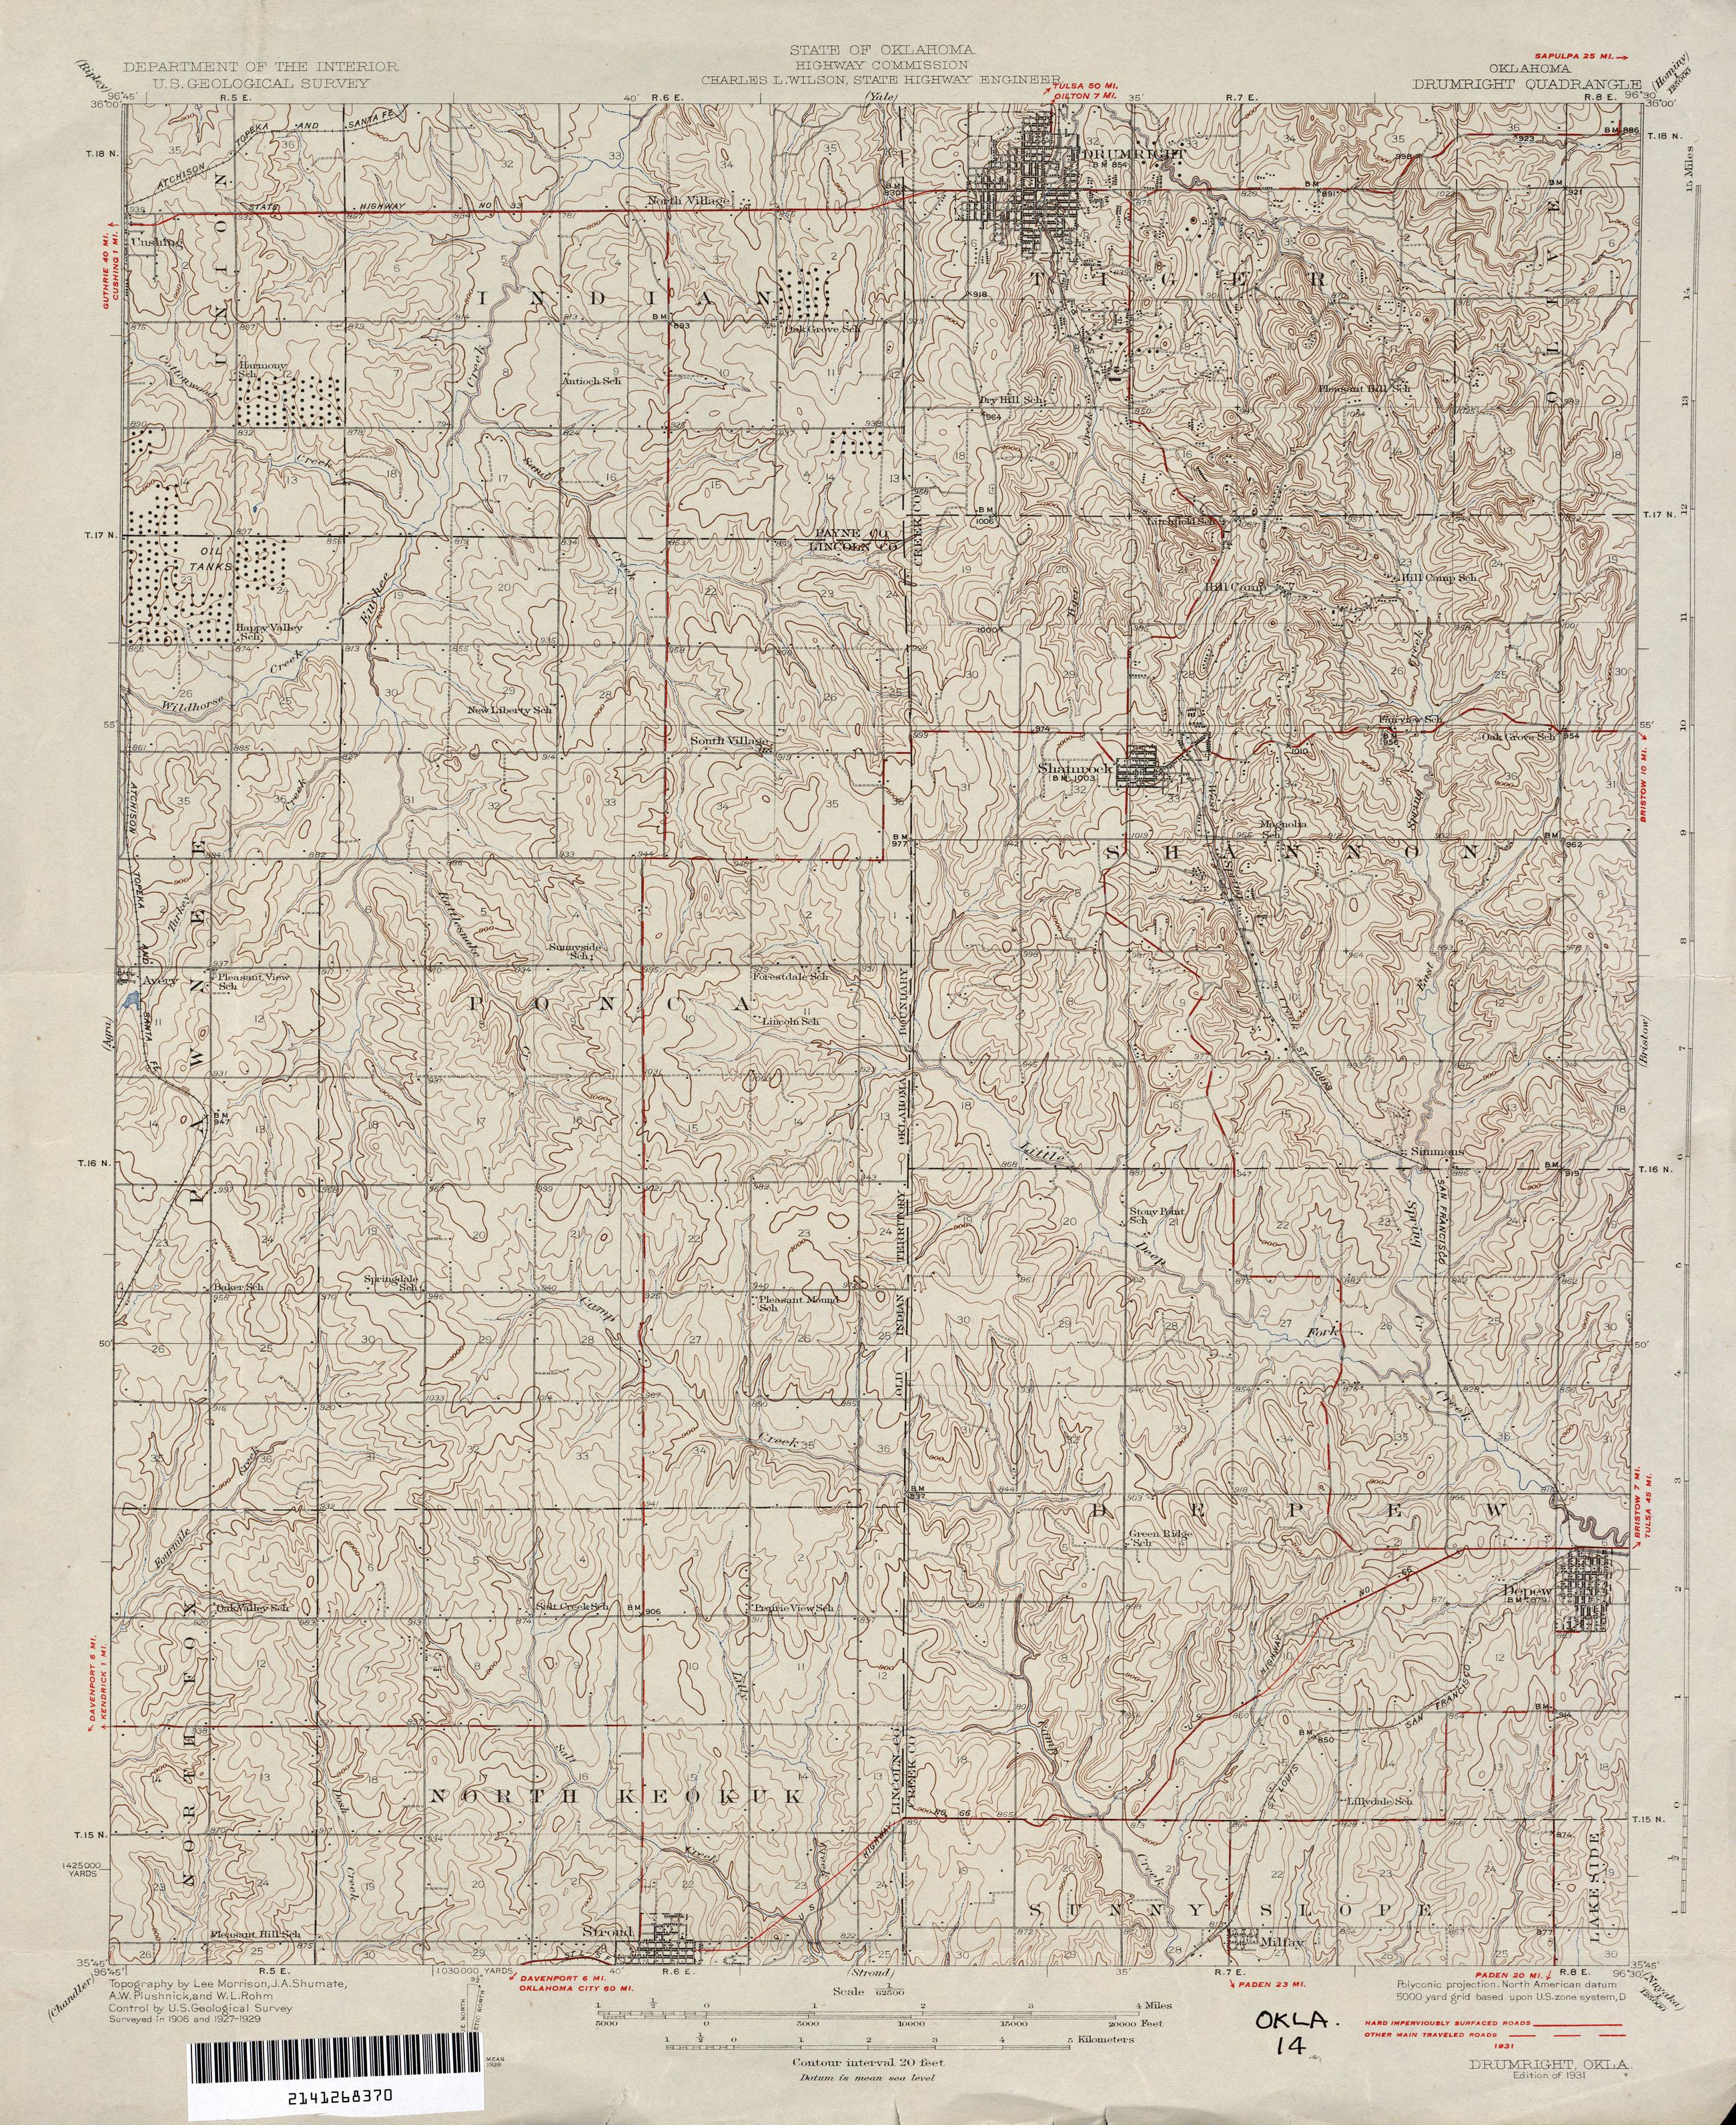 Oklahoma Historical Topographic Maps - Perry-Castañeda Map ...